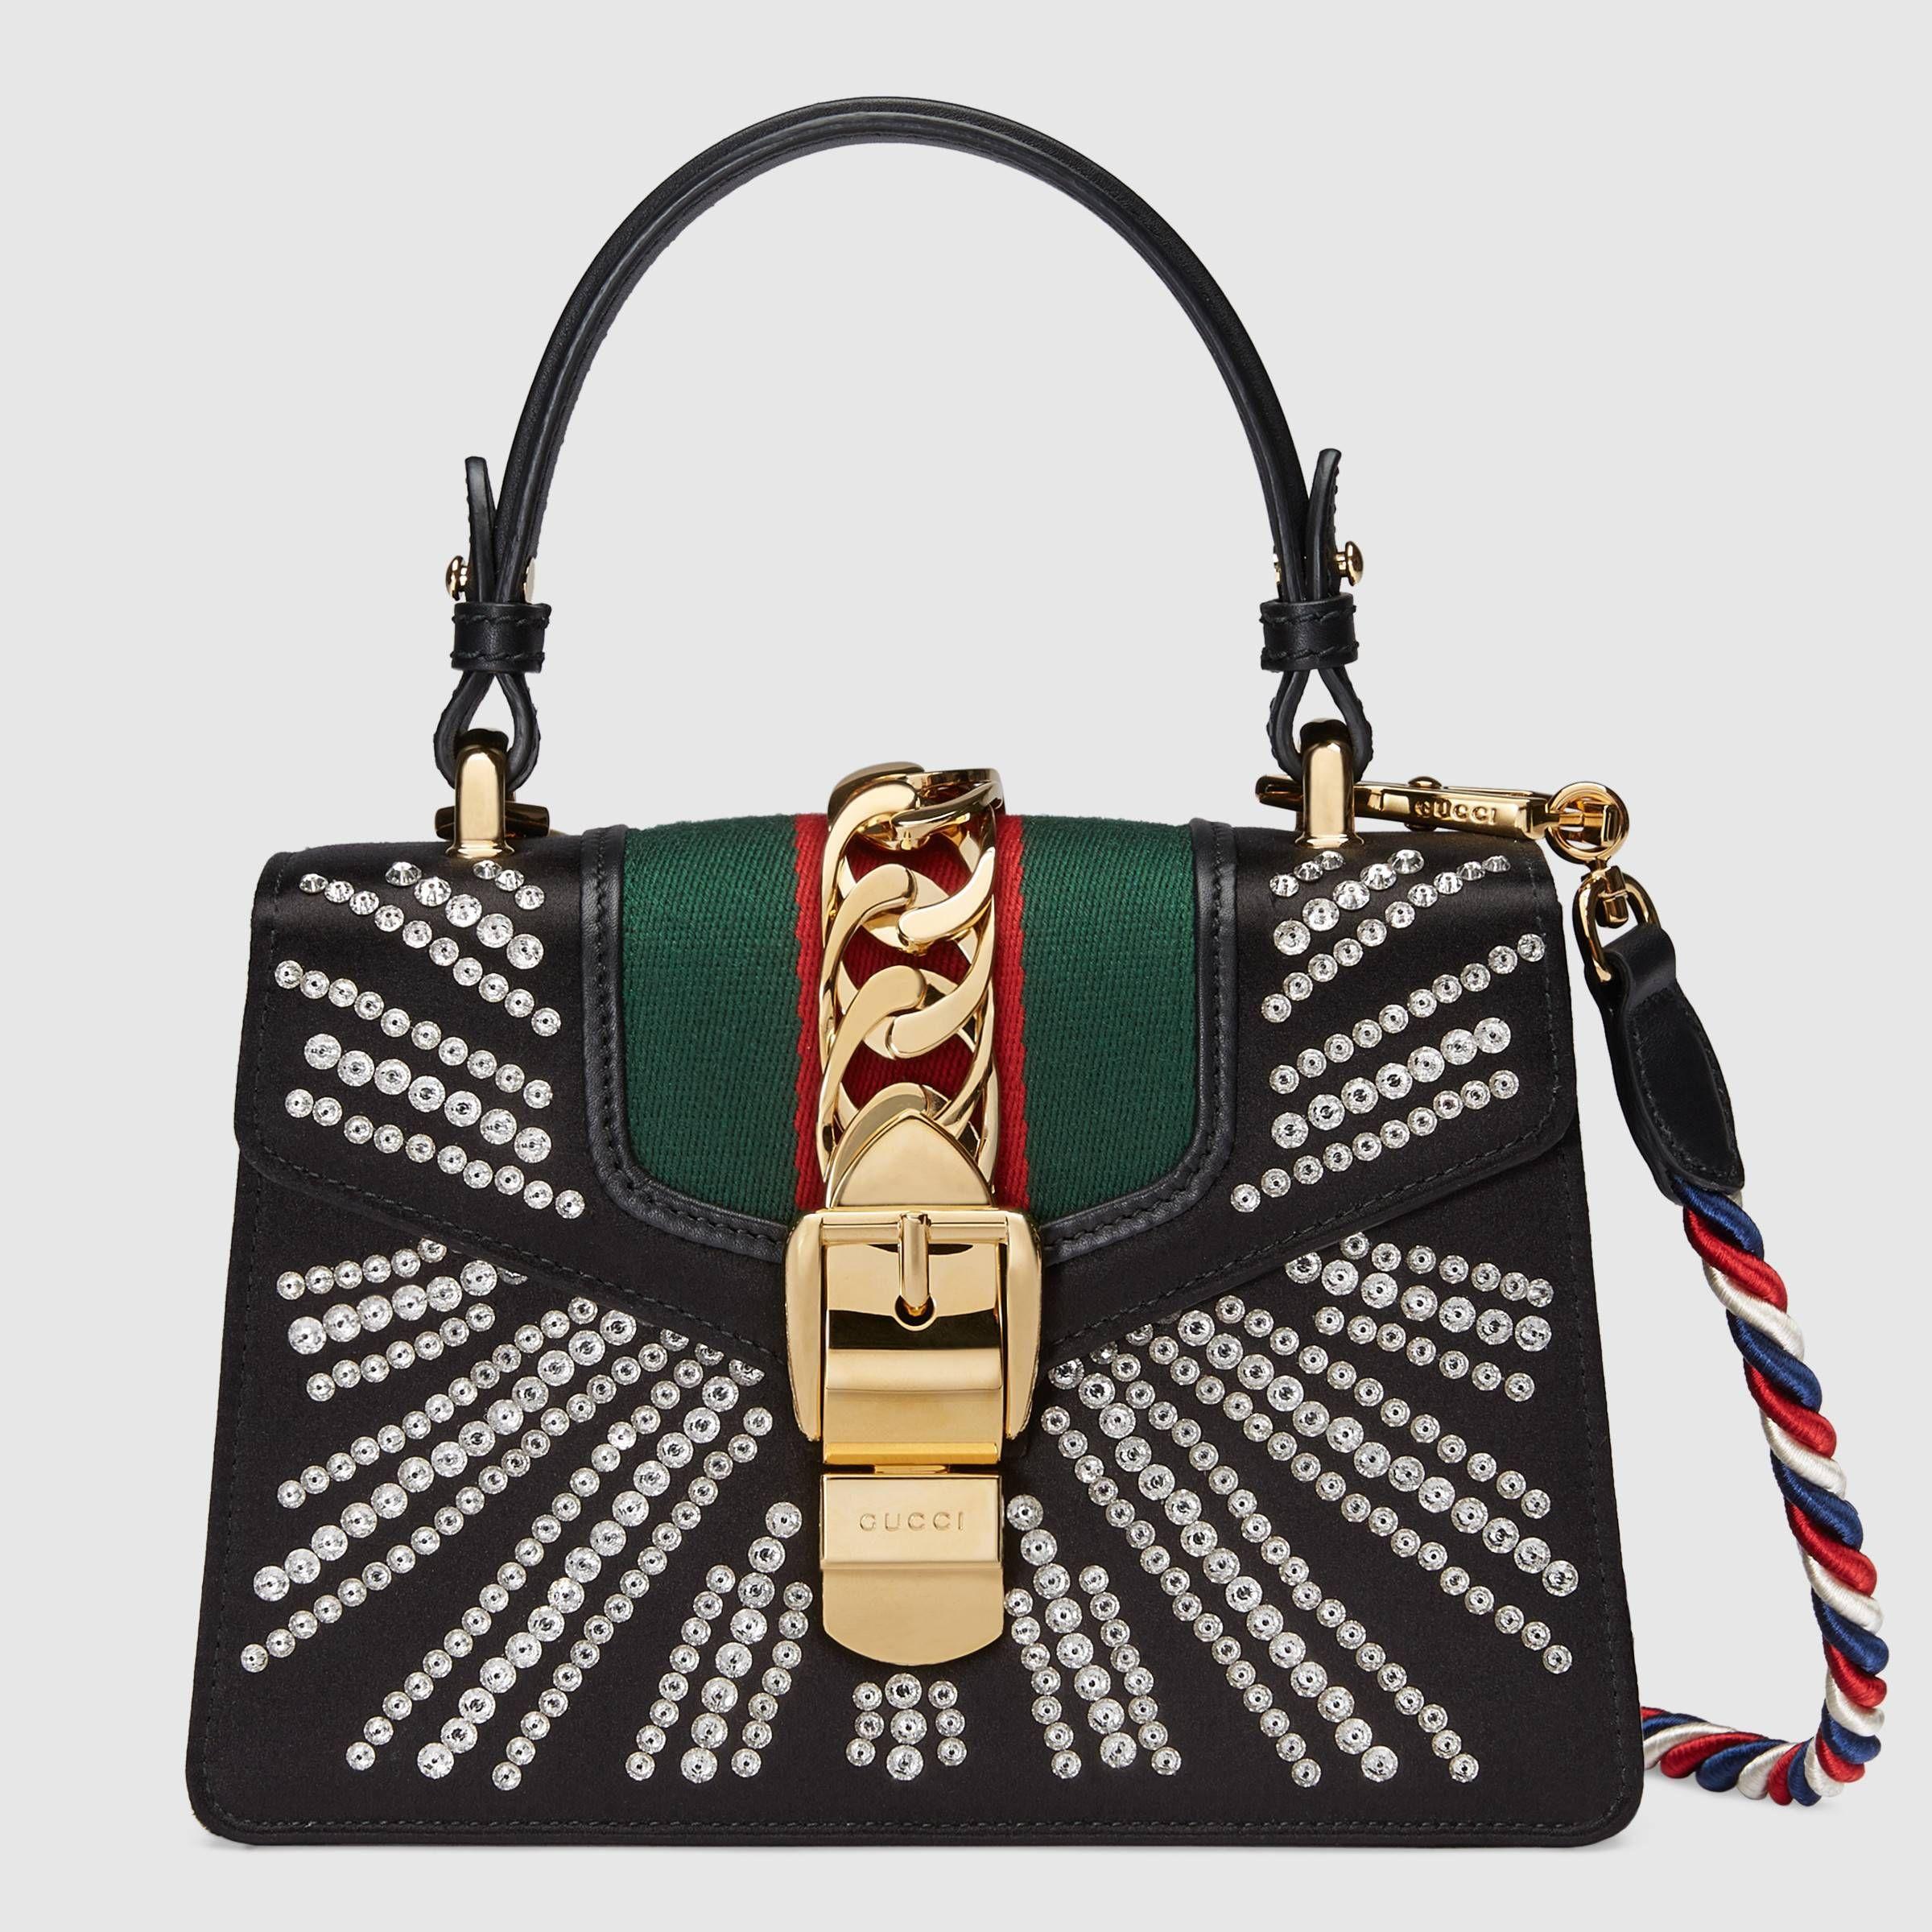 Embroidered Bling Crystal leather Shoulder Bag Cross Body Bag Gift Ideas for her